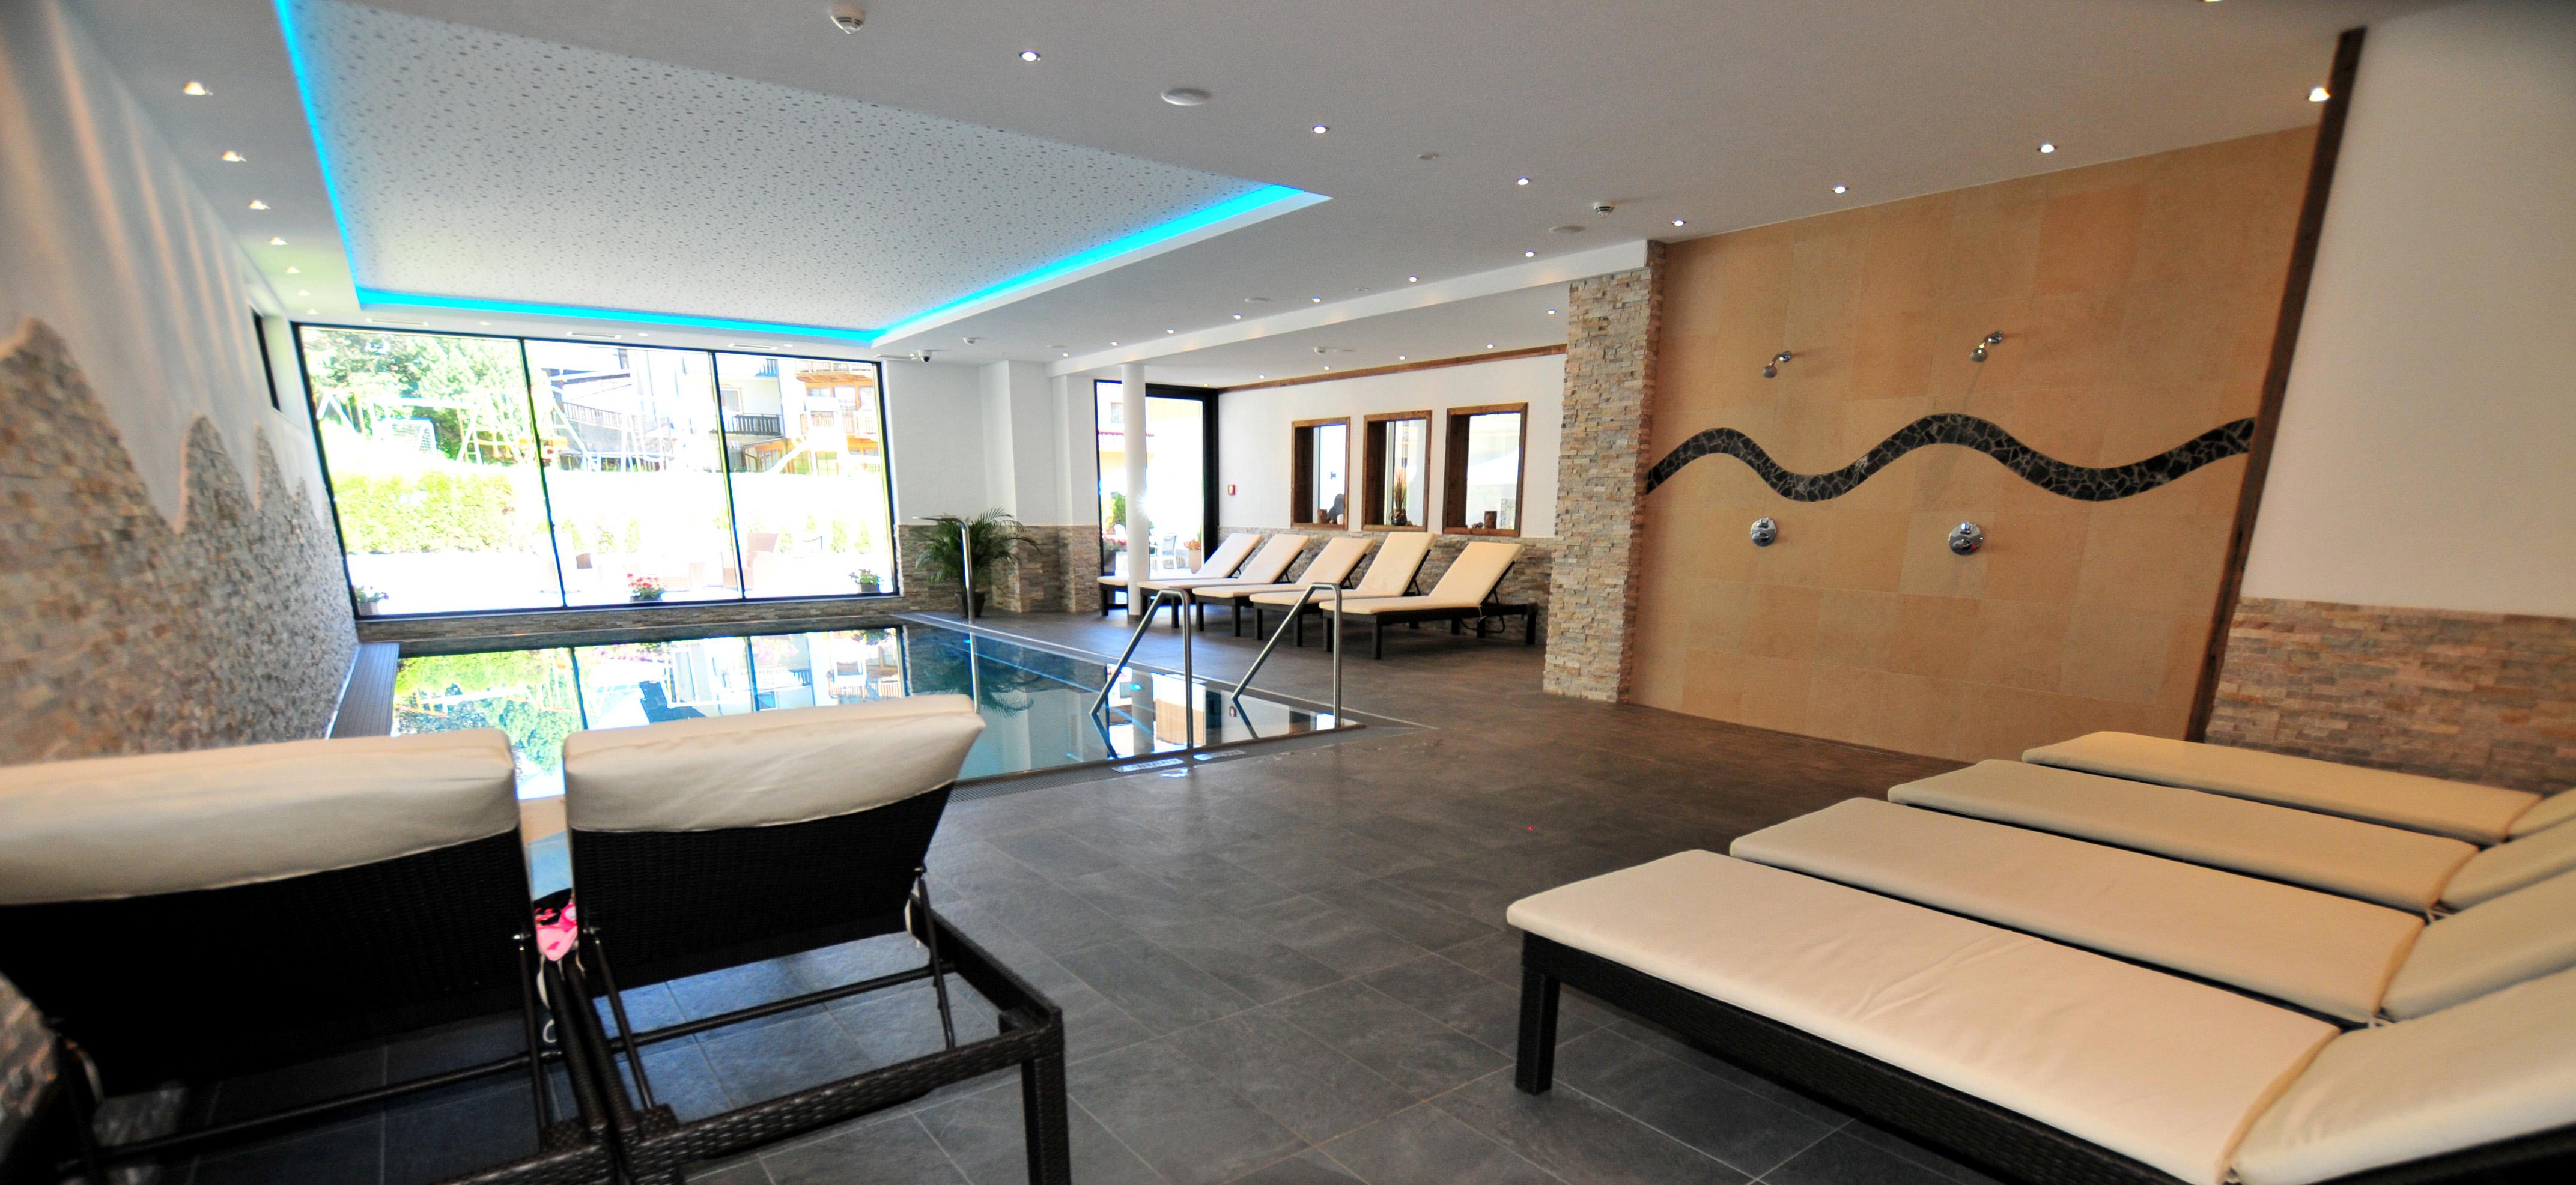 Sport Passler, Haus Passler, Haus Scheiber - Wellness 15 Sport Schwimmbad Designs